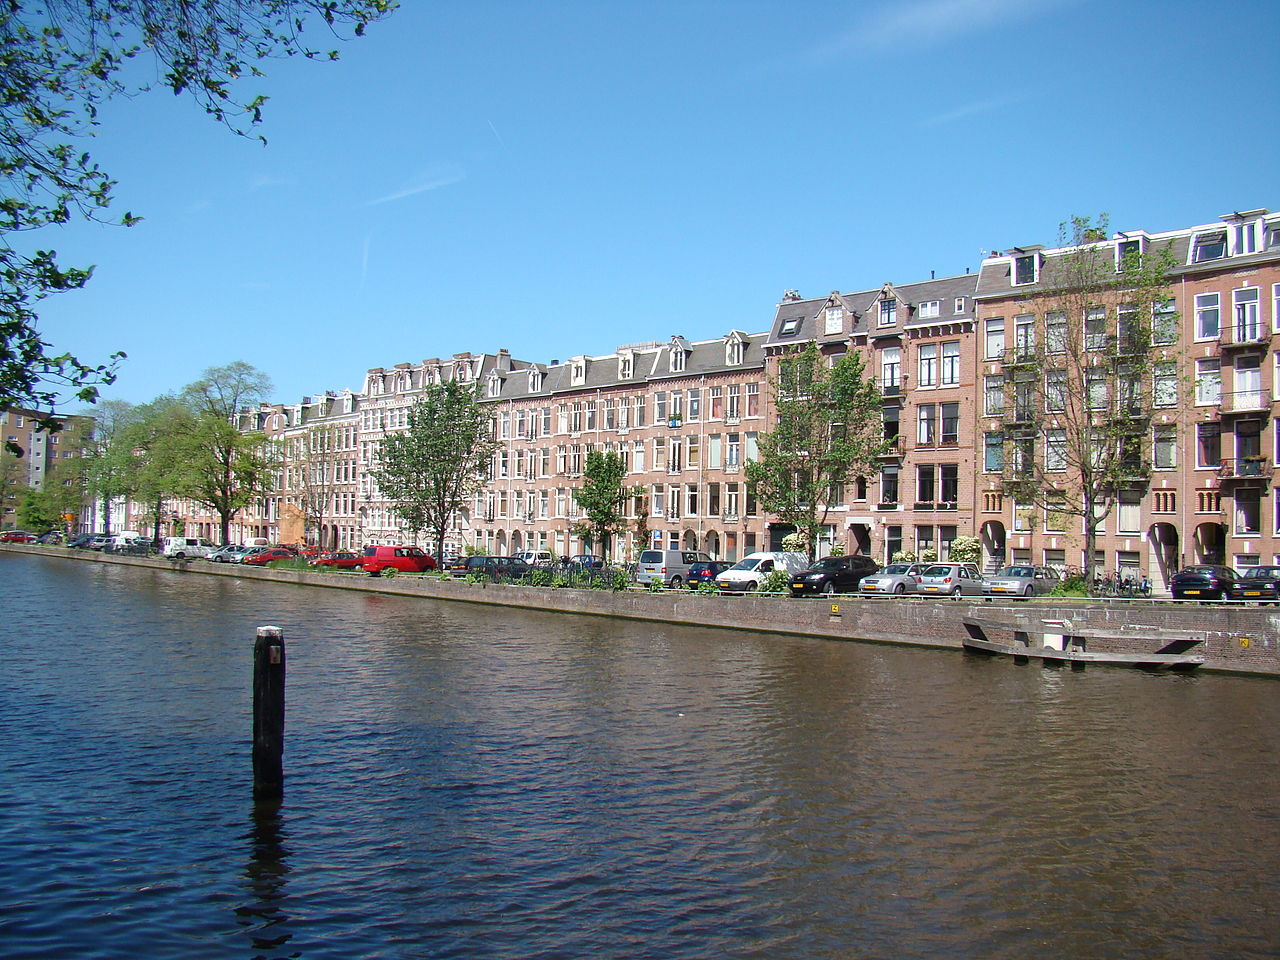 Каналы Амстердама, Kattensloot